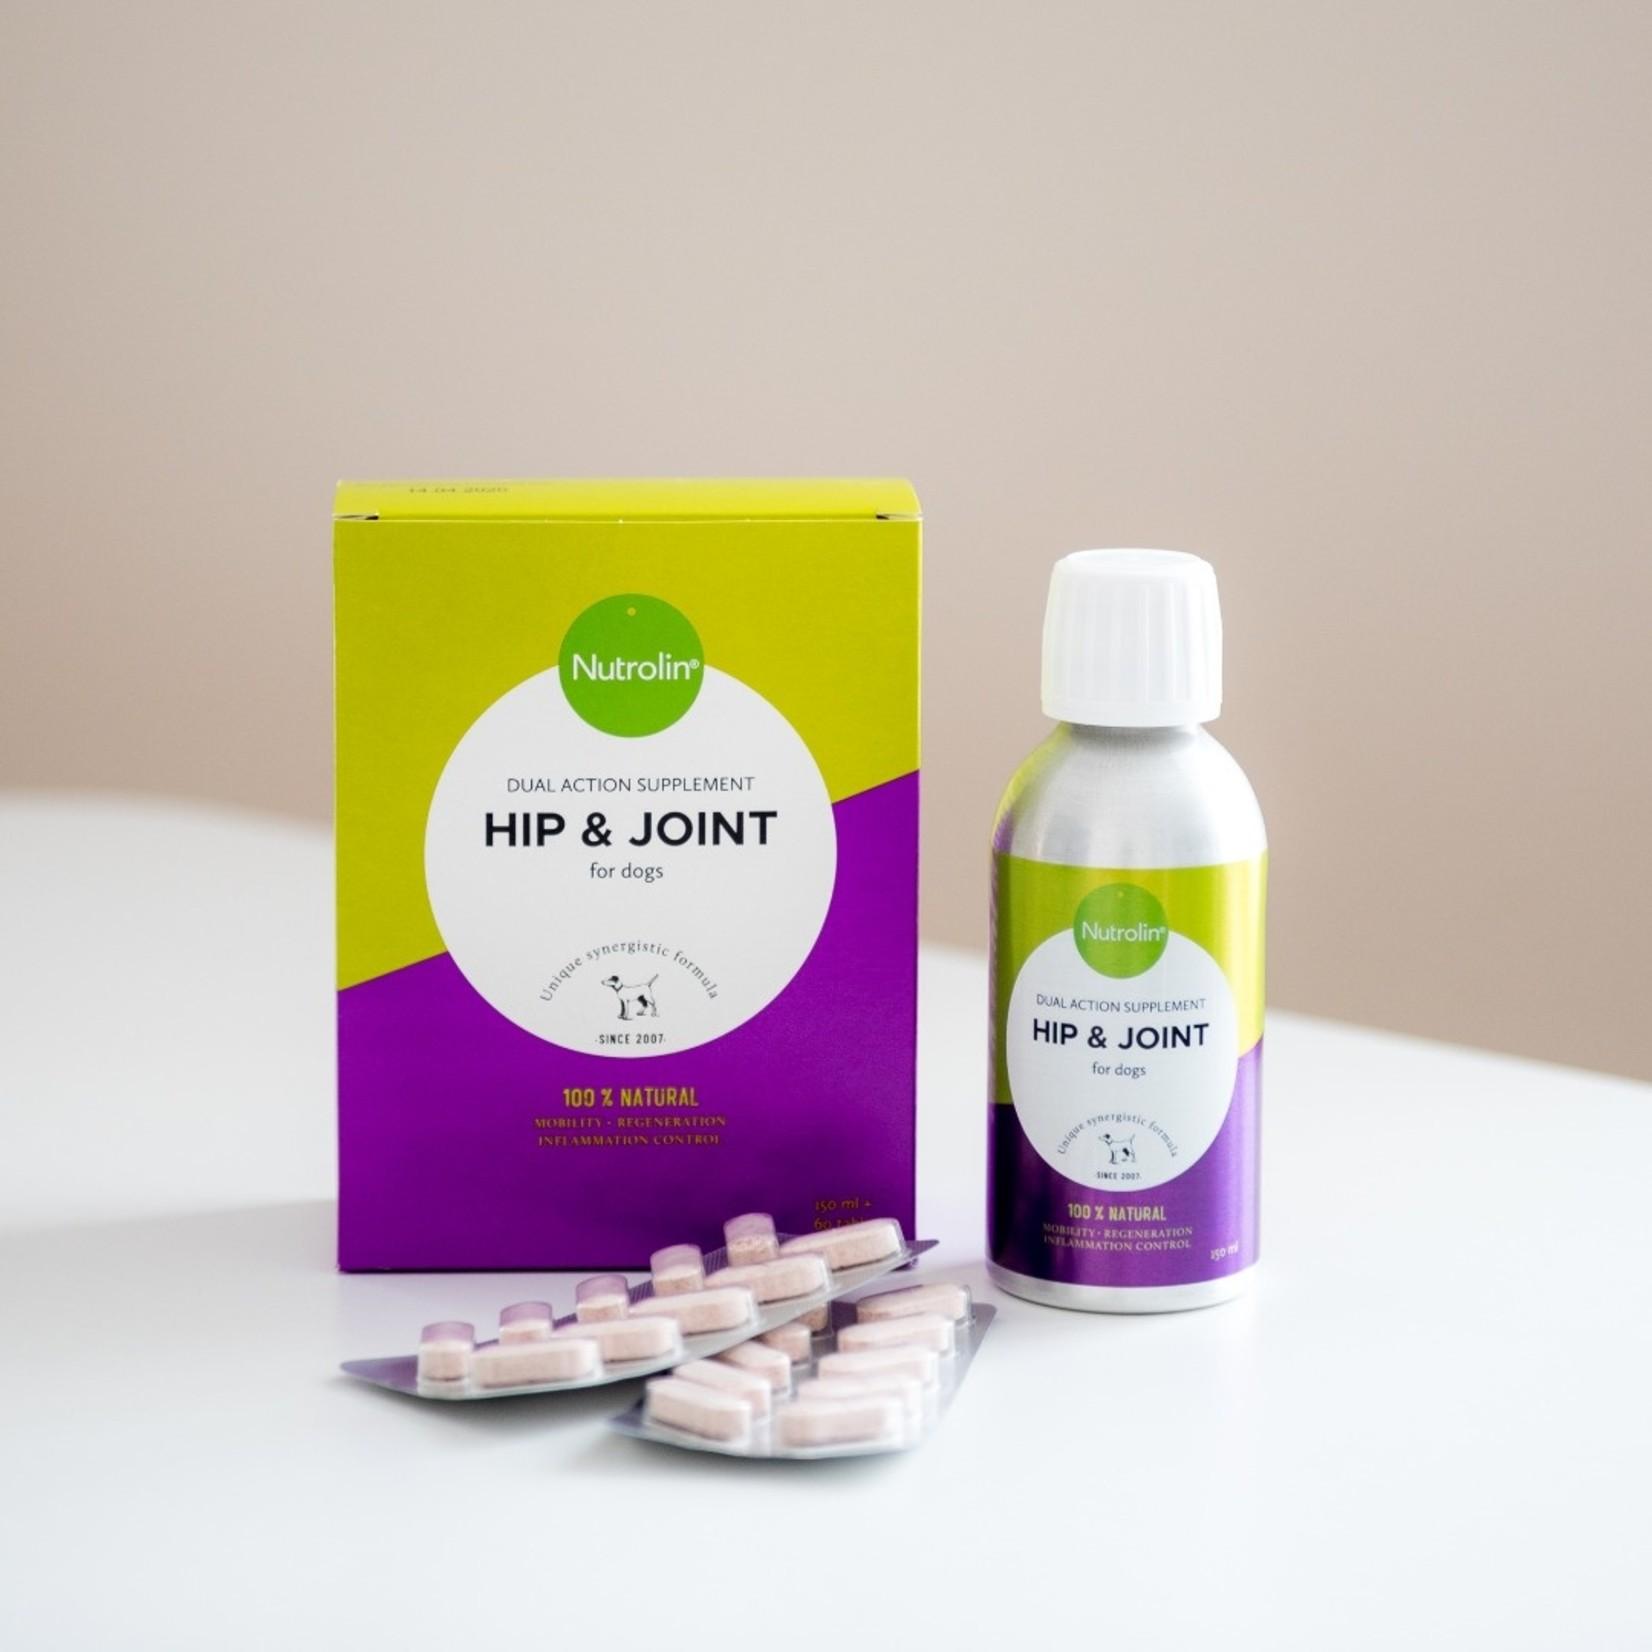 Nutrolin Nutrolin Hip & Joint